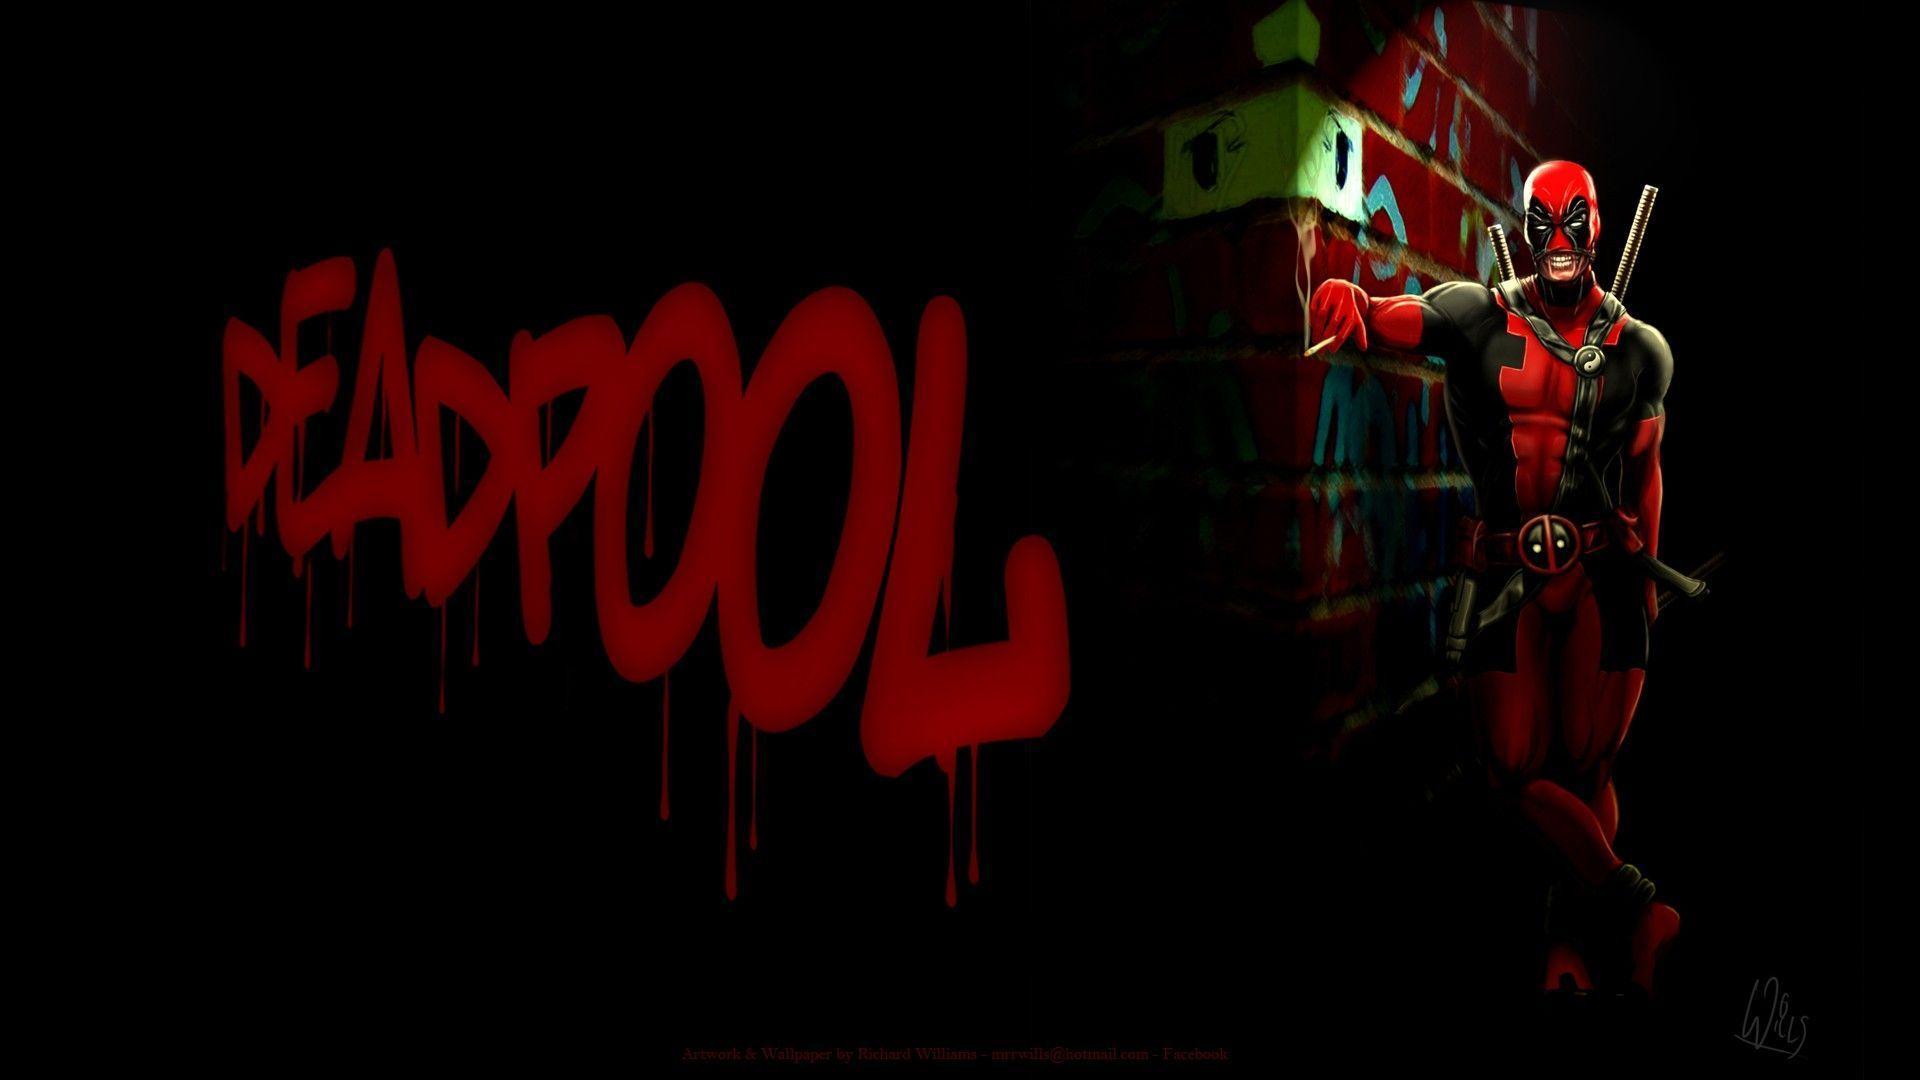 Wallpapers For > Deadpool Wallpaper Hd